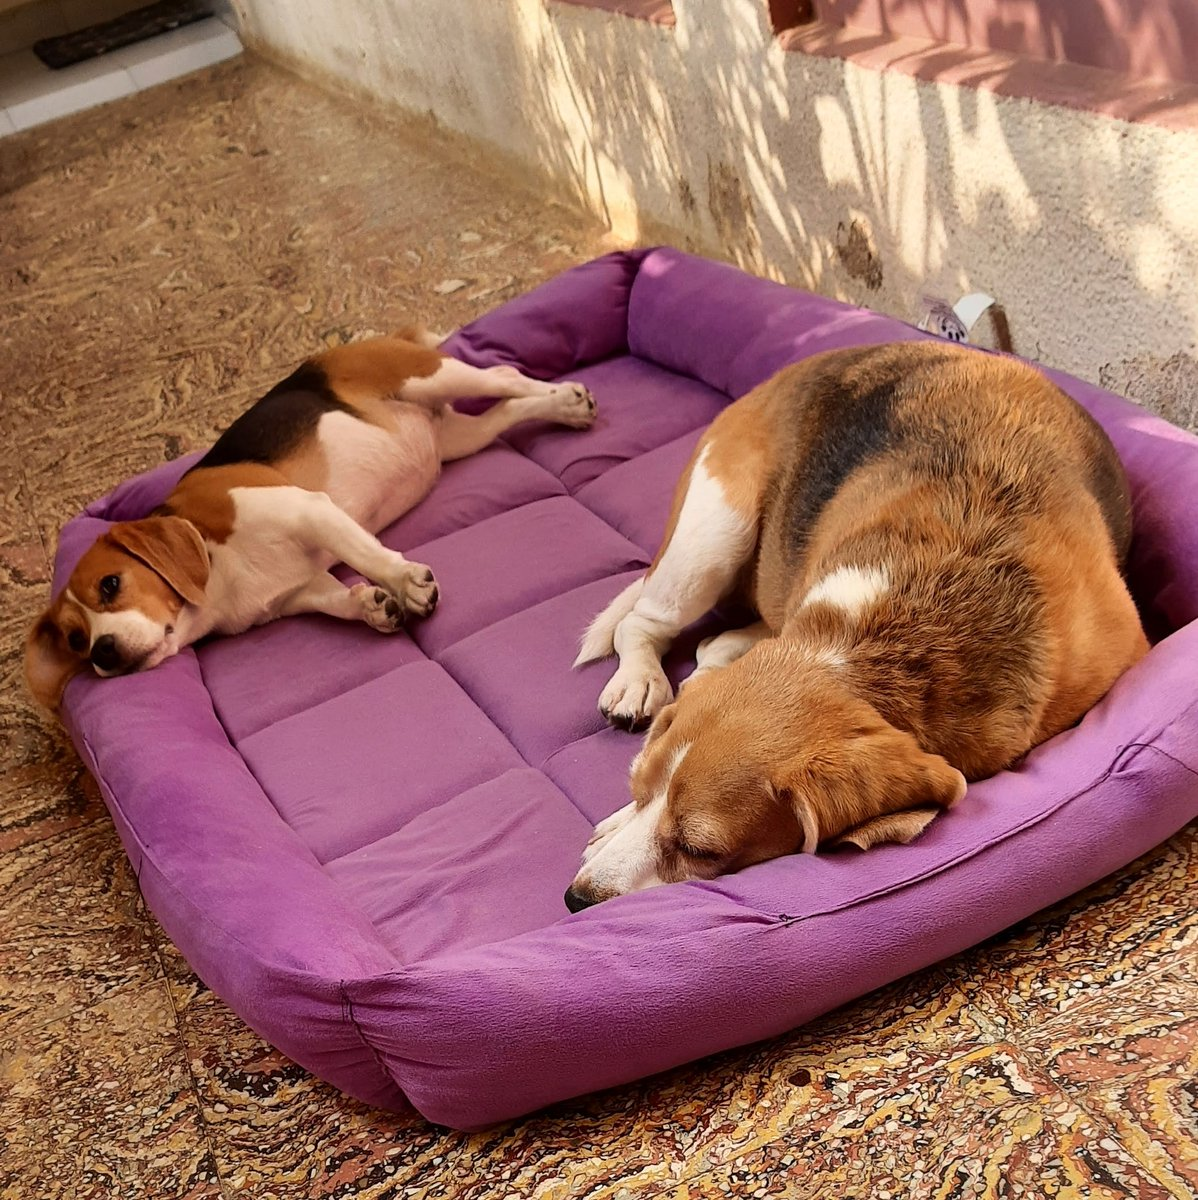 Happy weekend good people!! . . #petparents #puppy #beagle #pets #leash #harness #beagles #fashion #petfashion #trendy #cute #swag #designer #beaglesisters